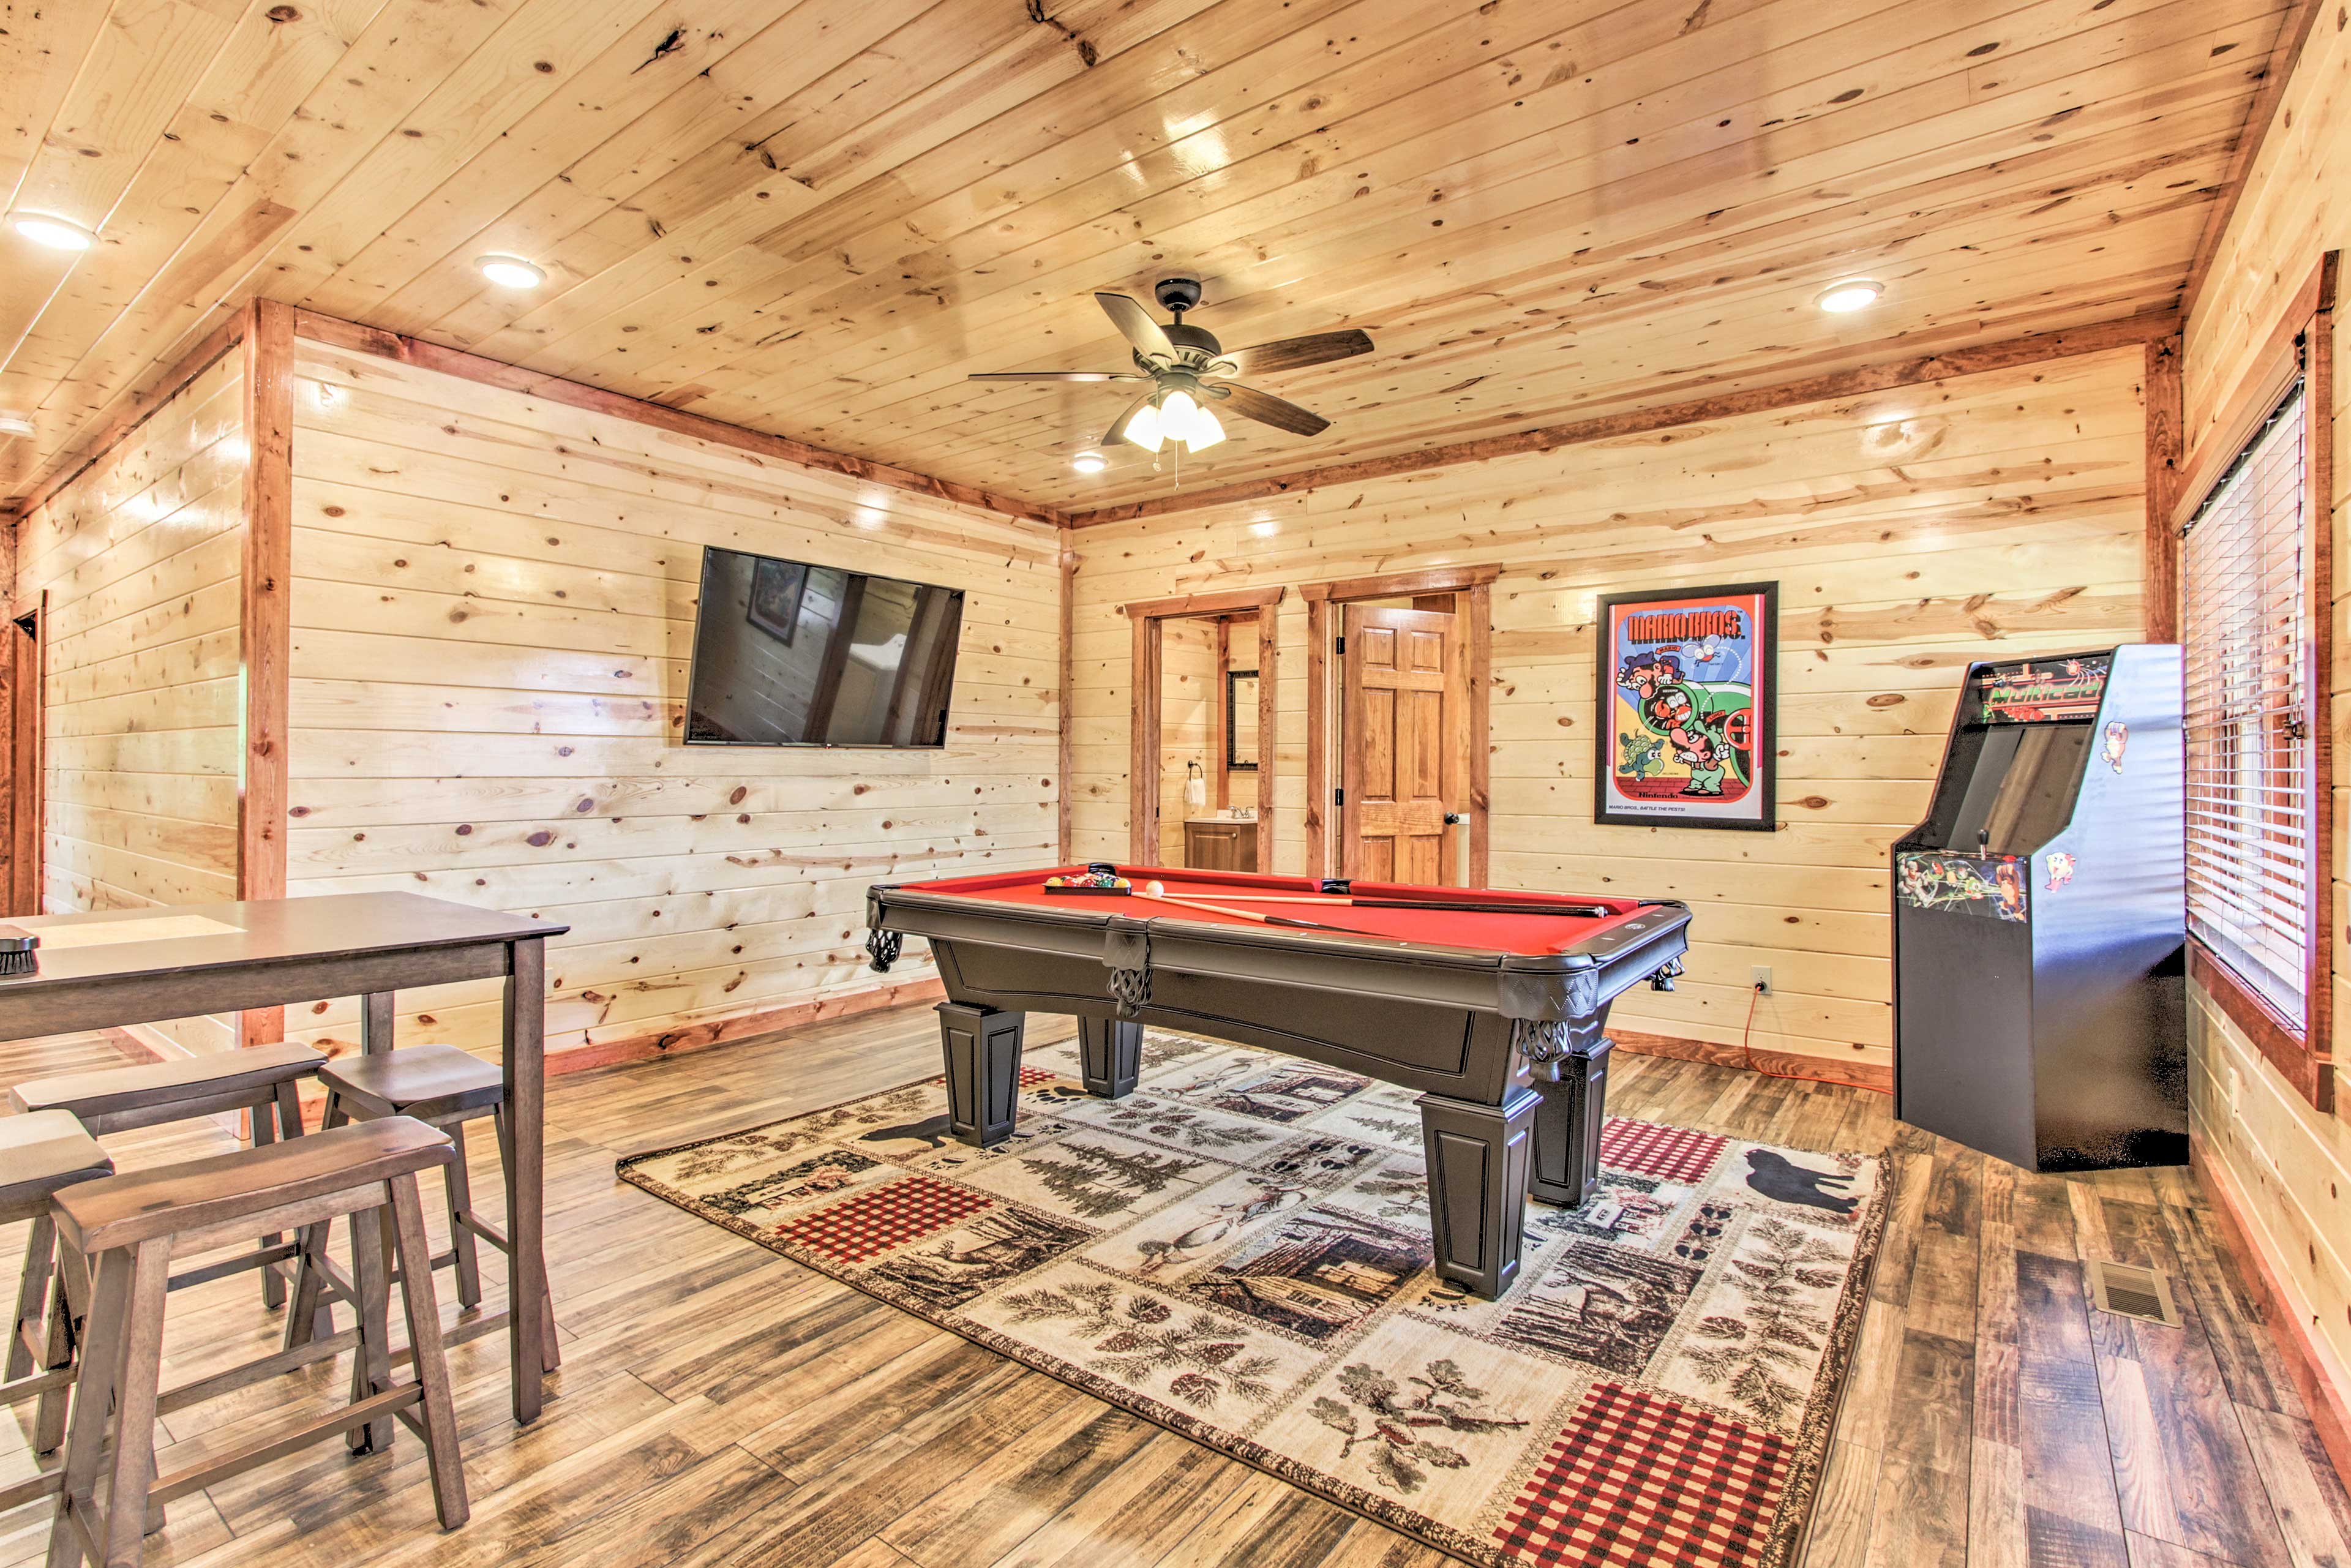 Game Room | Smart TV | Pool Table